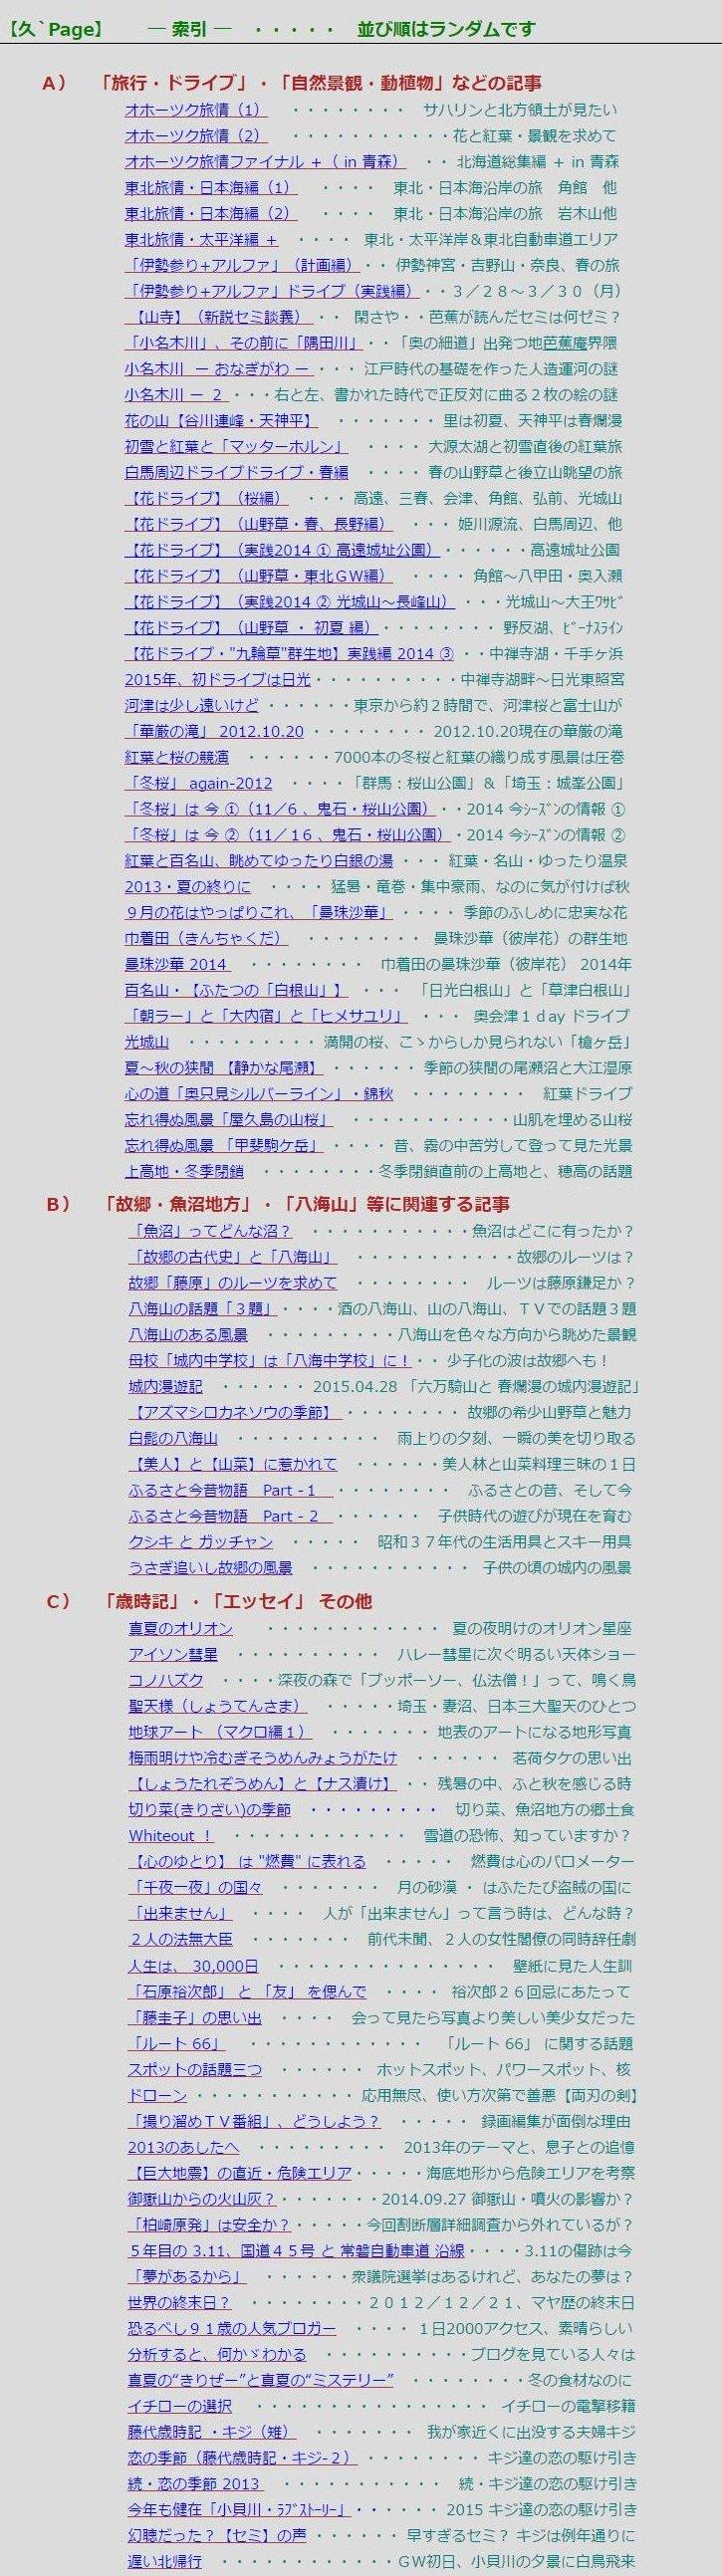 http://hakkaisan-photo.com/q/mokuji/%E4%B9%85Page%E3%80%90%E7%9B%AE%E6%AC%A1%E3%80%91%E3%80%802016.06.11%E7%8F%BE%E5%9C%A8.JPG